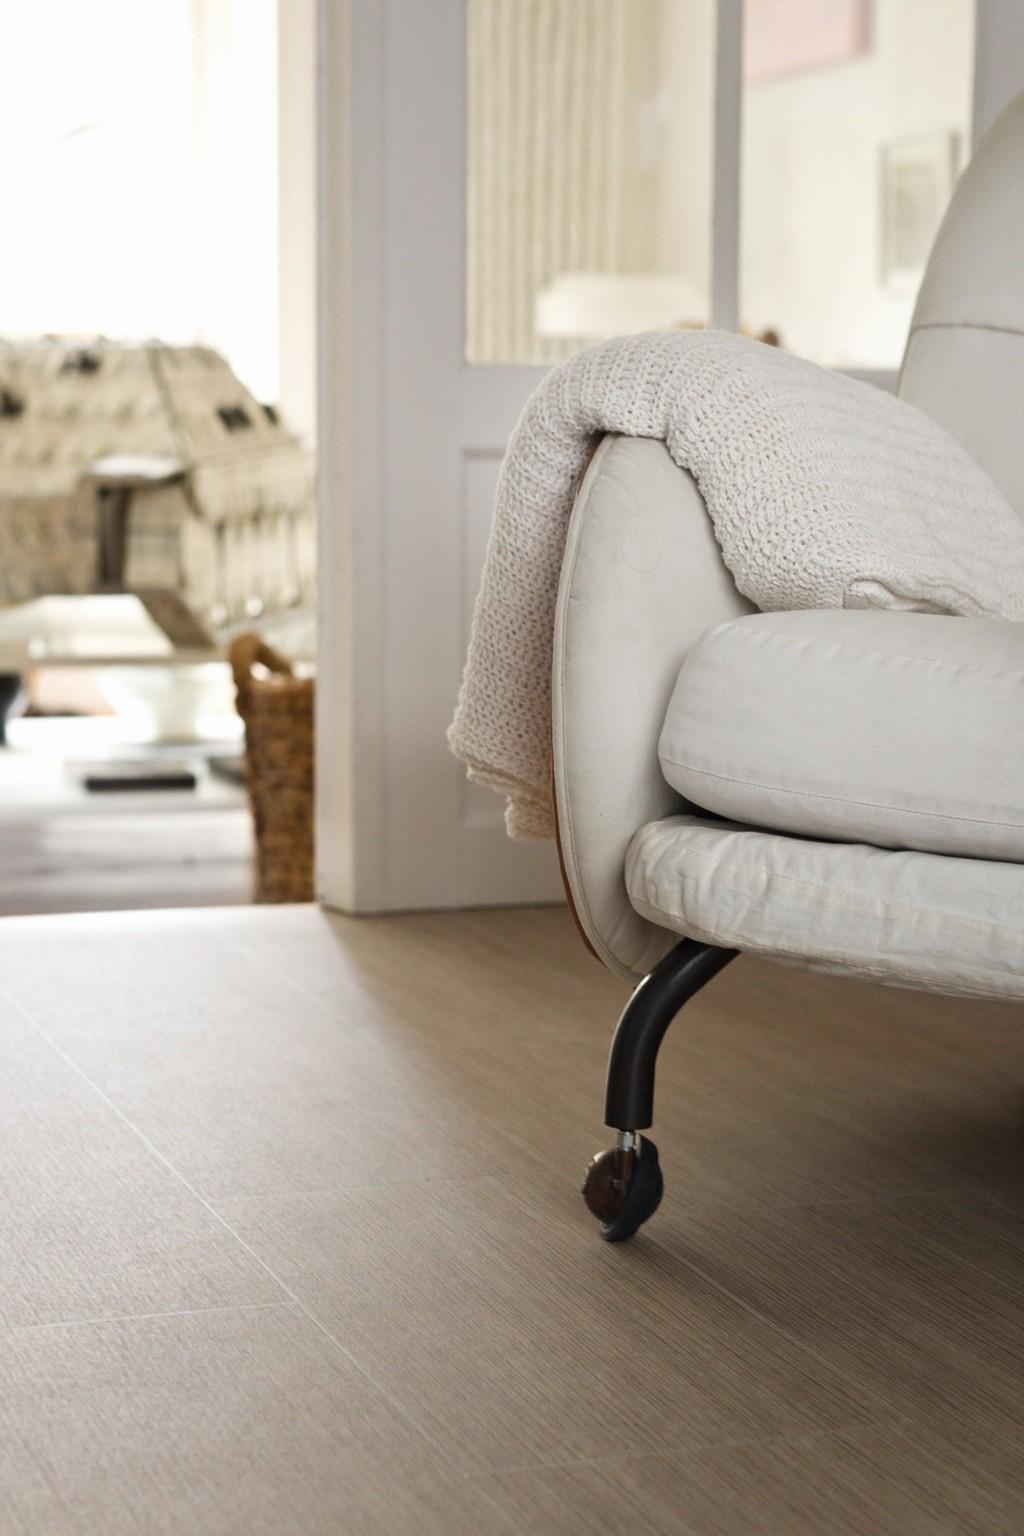 Wyre Abesch Vinyl Flooring Tapi Carpets Amp Floors